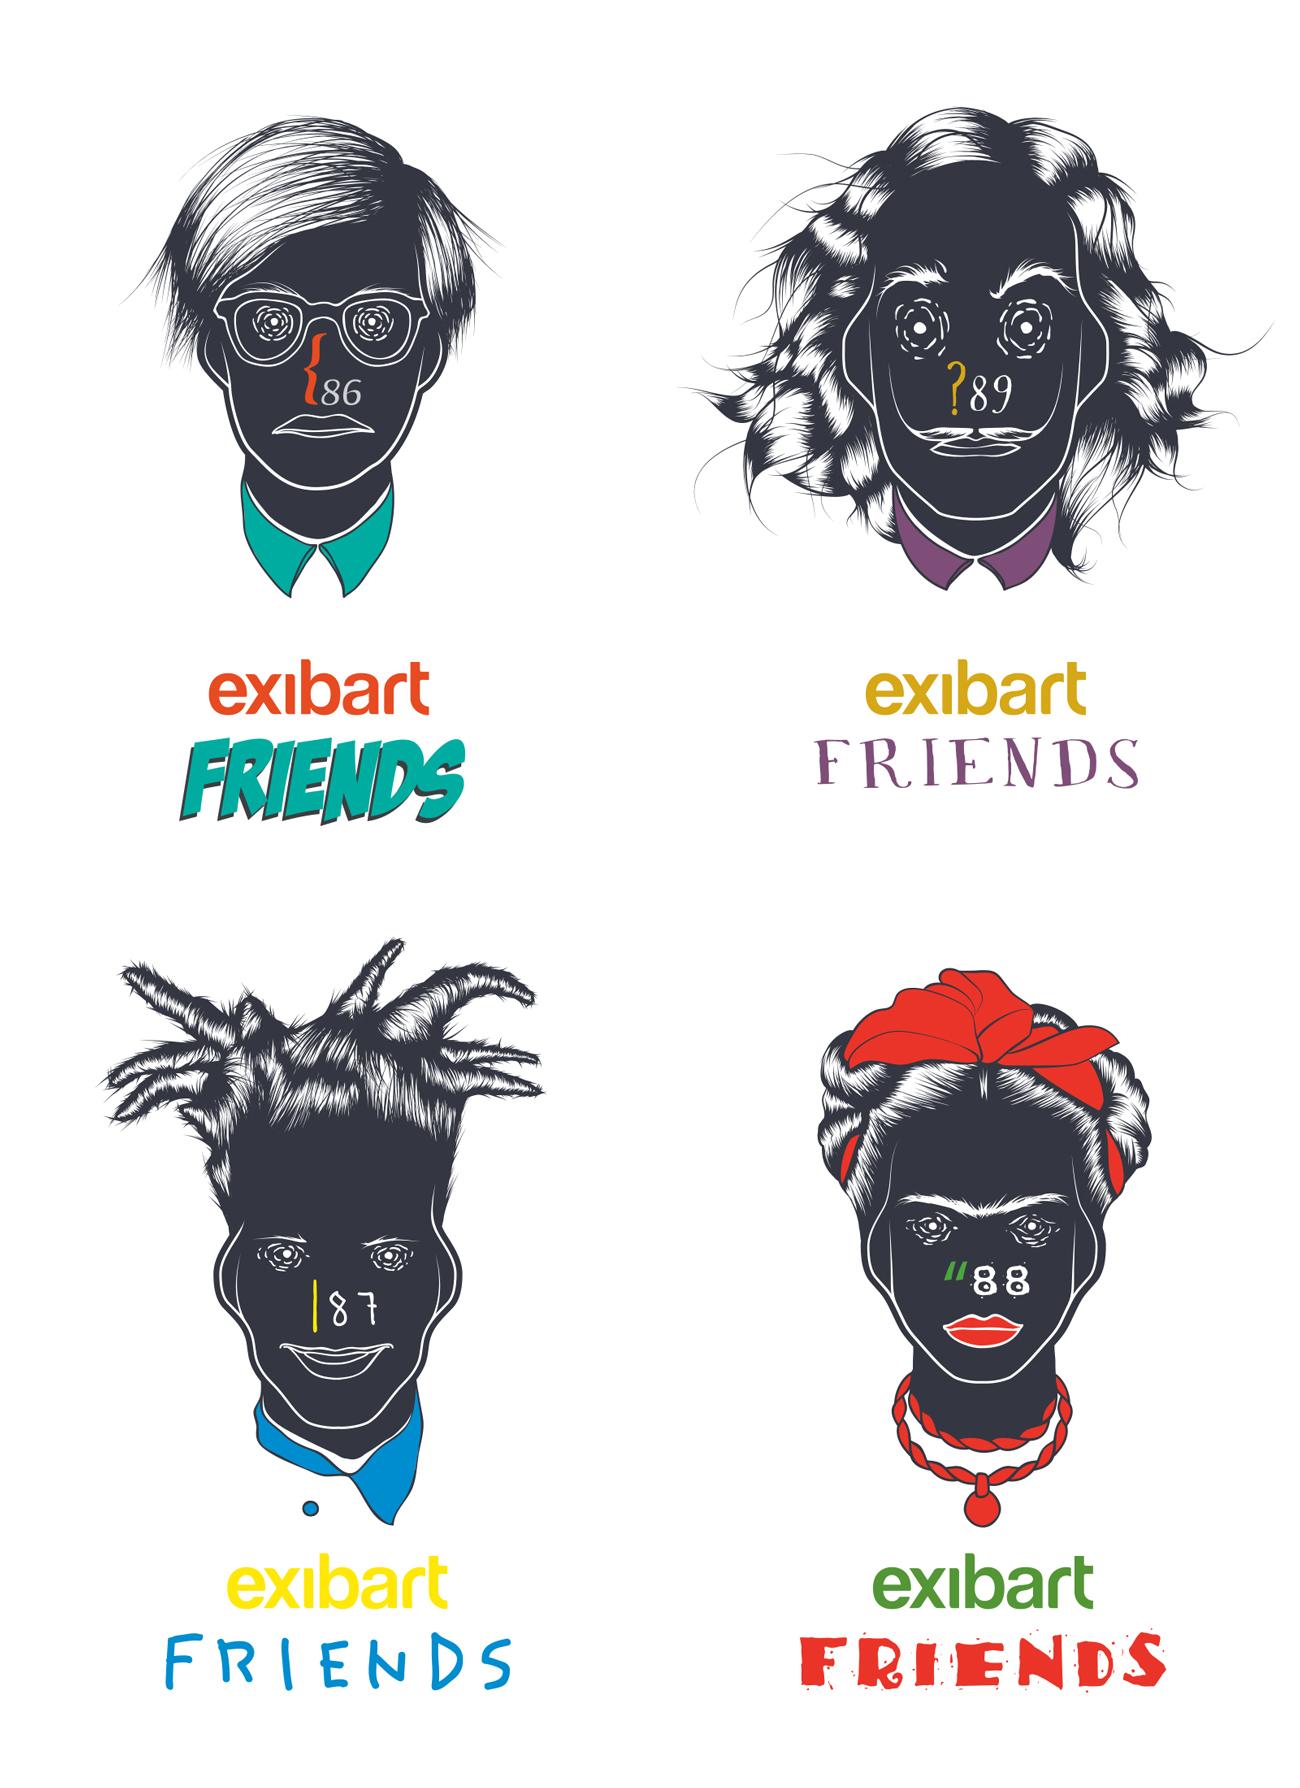 fabio-bevilacqua-exibart-illustration